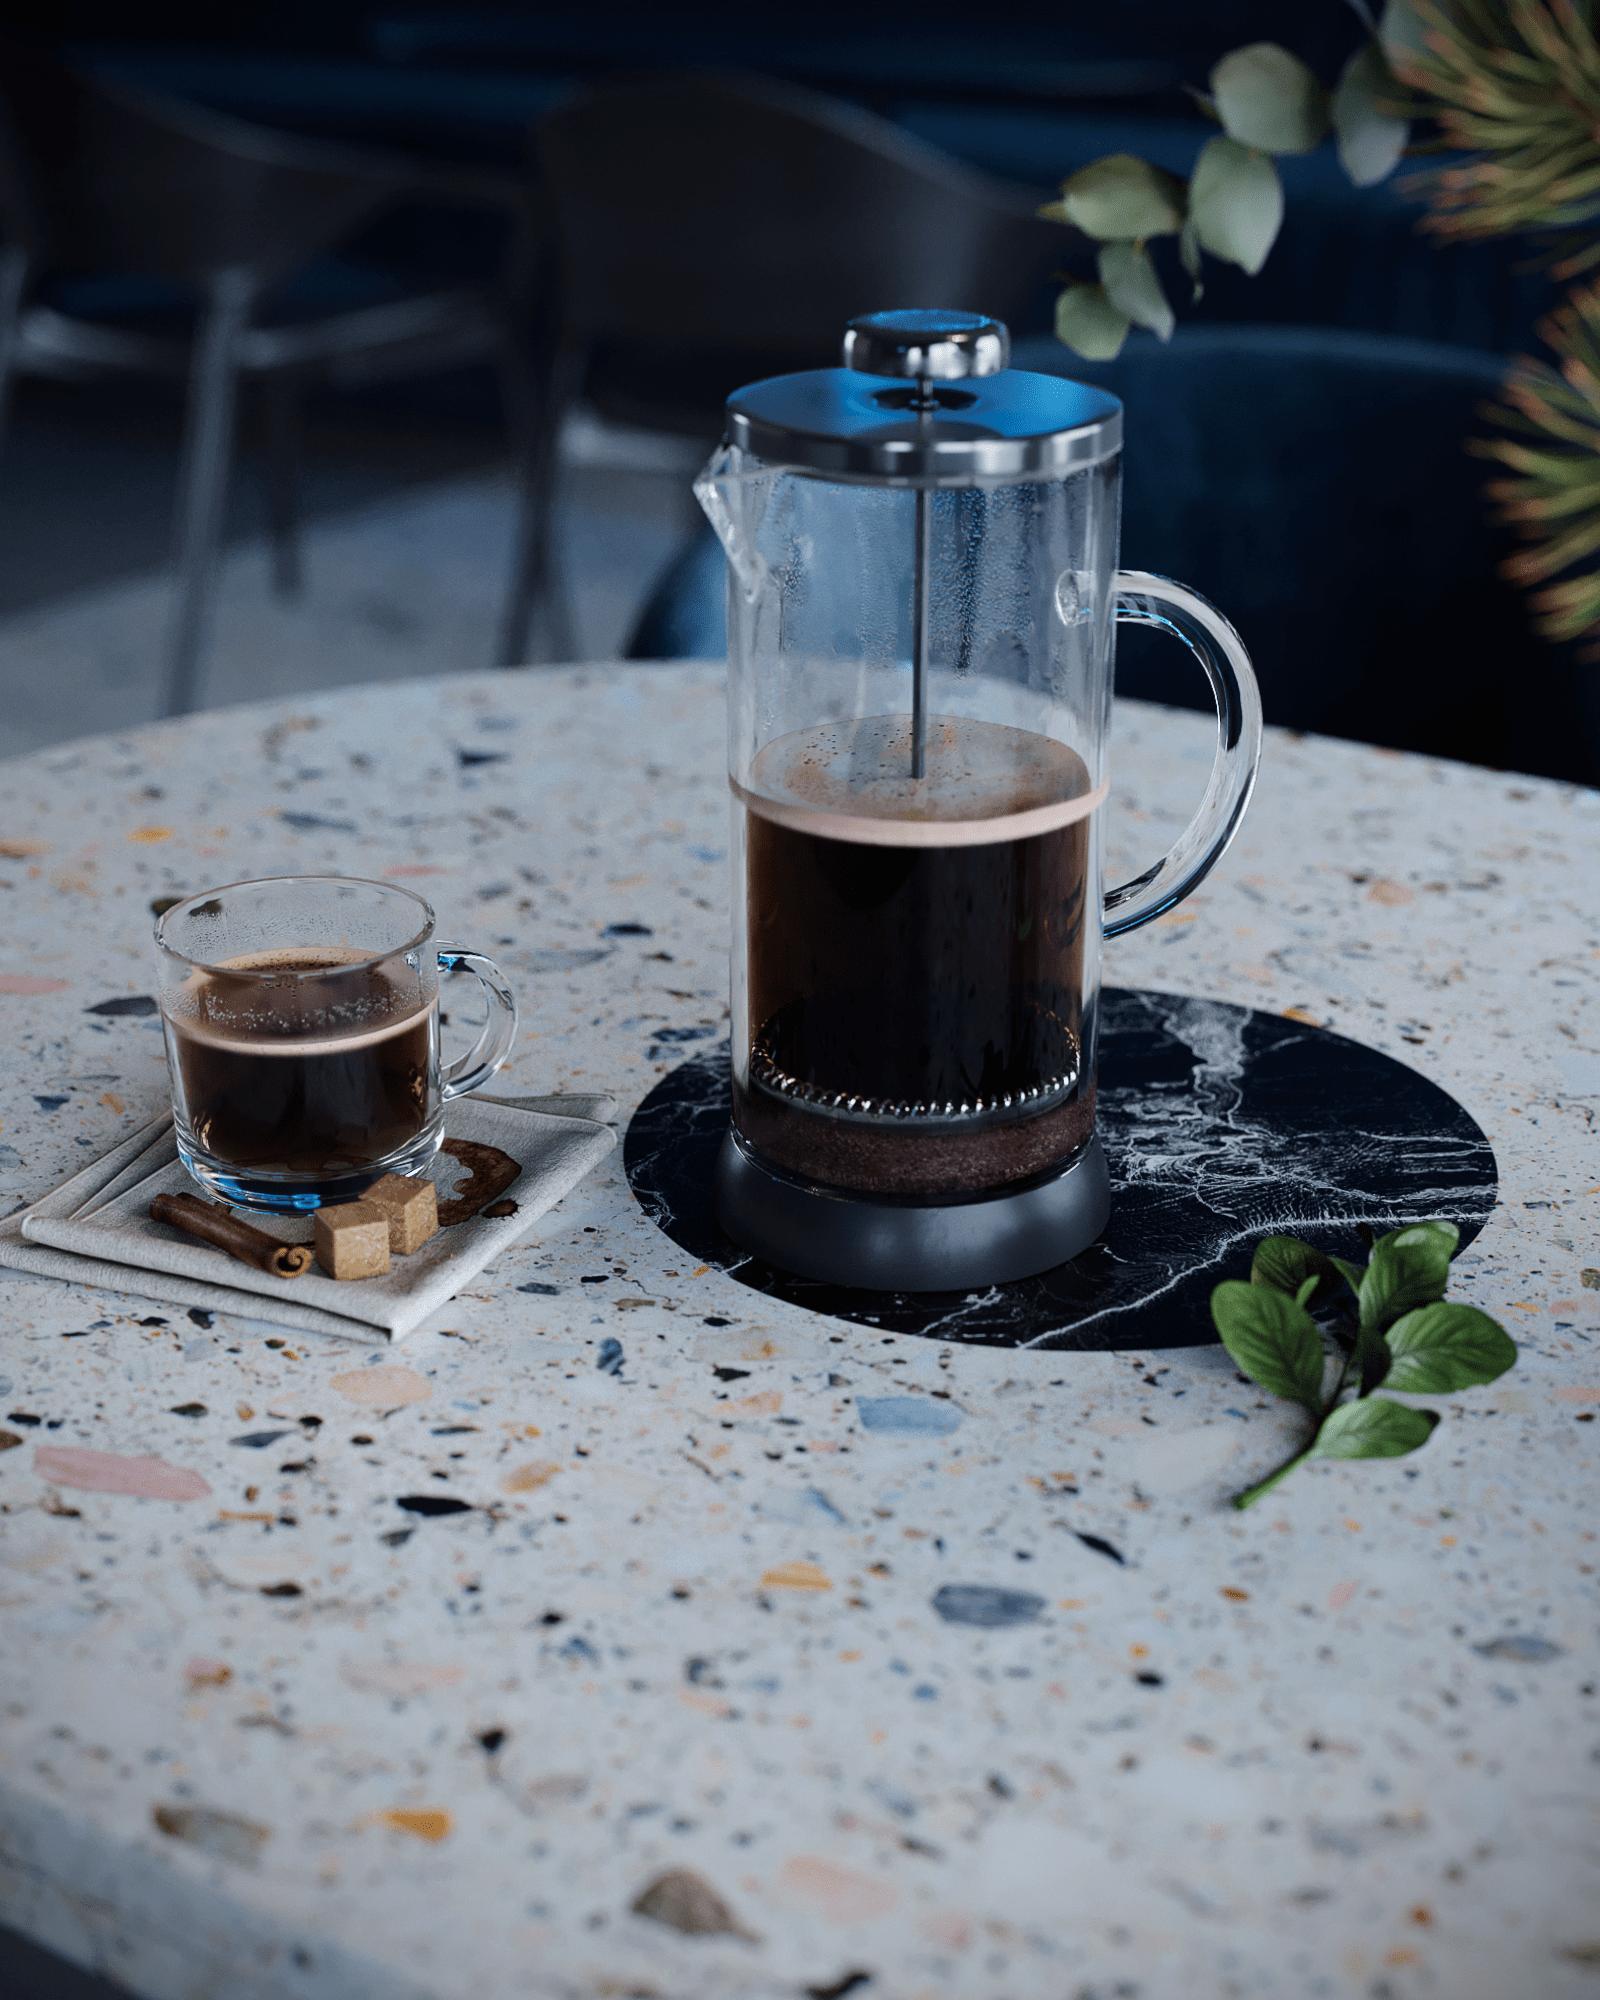 https://studioautograph.com/wp-content/uploads/2021/02/studio-autograph-ltd-berlin-design-cafe4-min.png